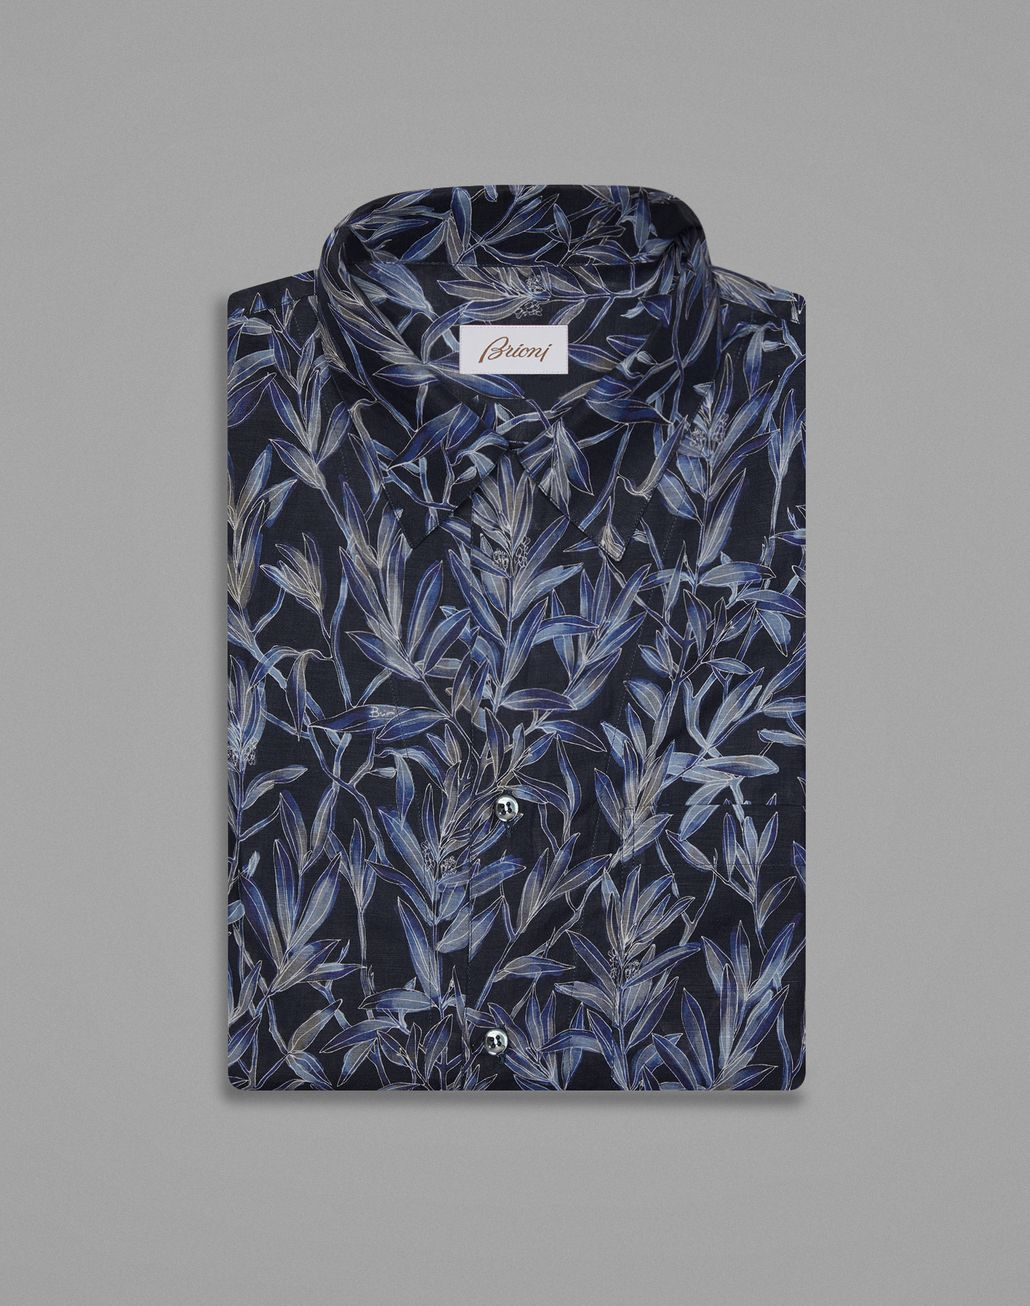 BRIONI Тёмно-синяя гавайская рубашка Повседневная рубашка Для Мужчин f